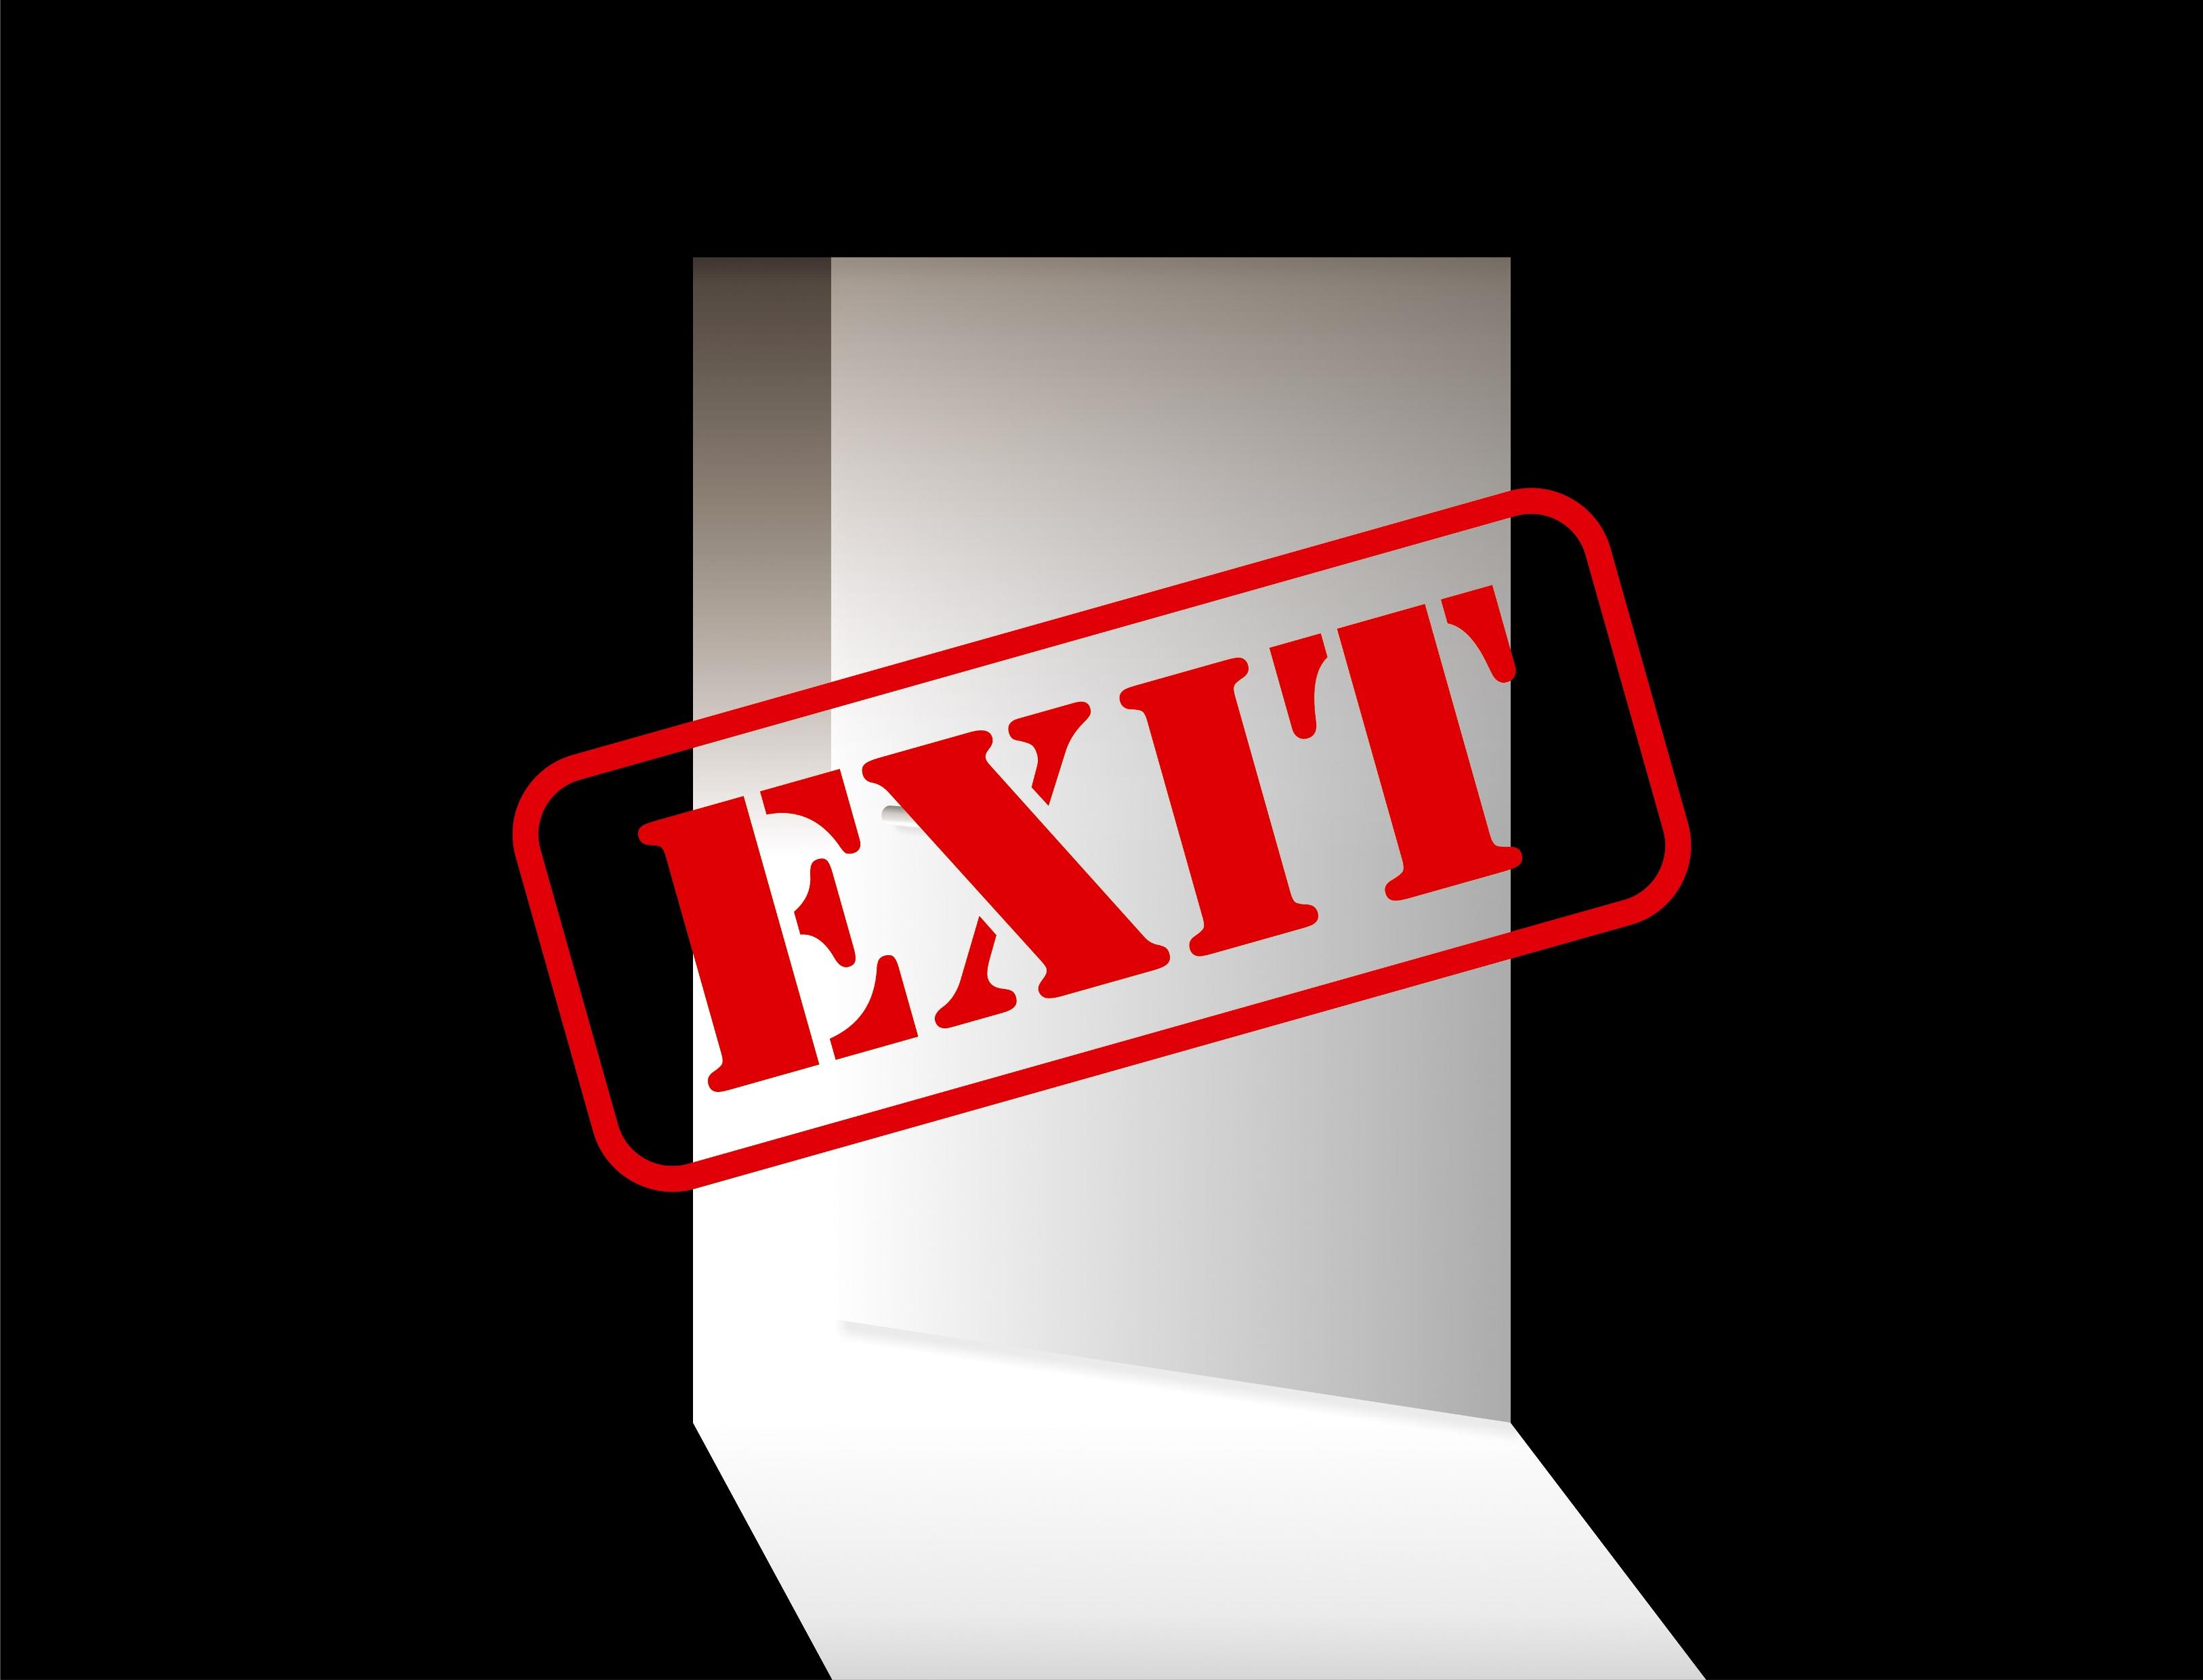 Broker CEO steps down as Steadfast snaps up underwriting agency